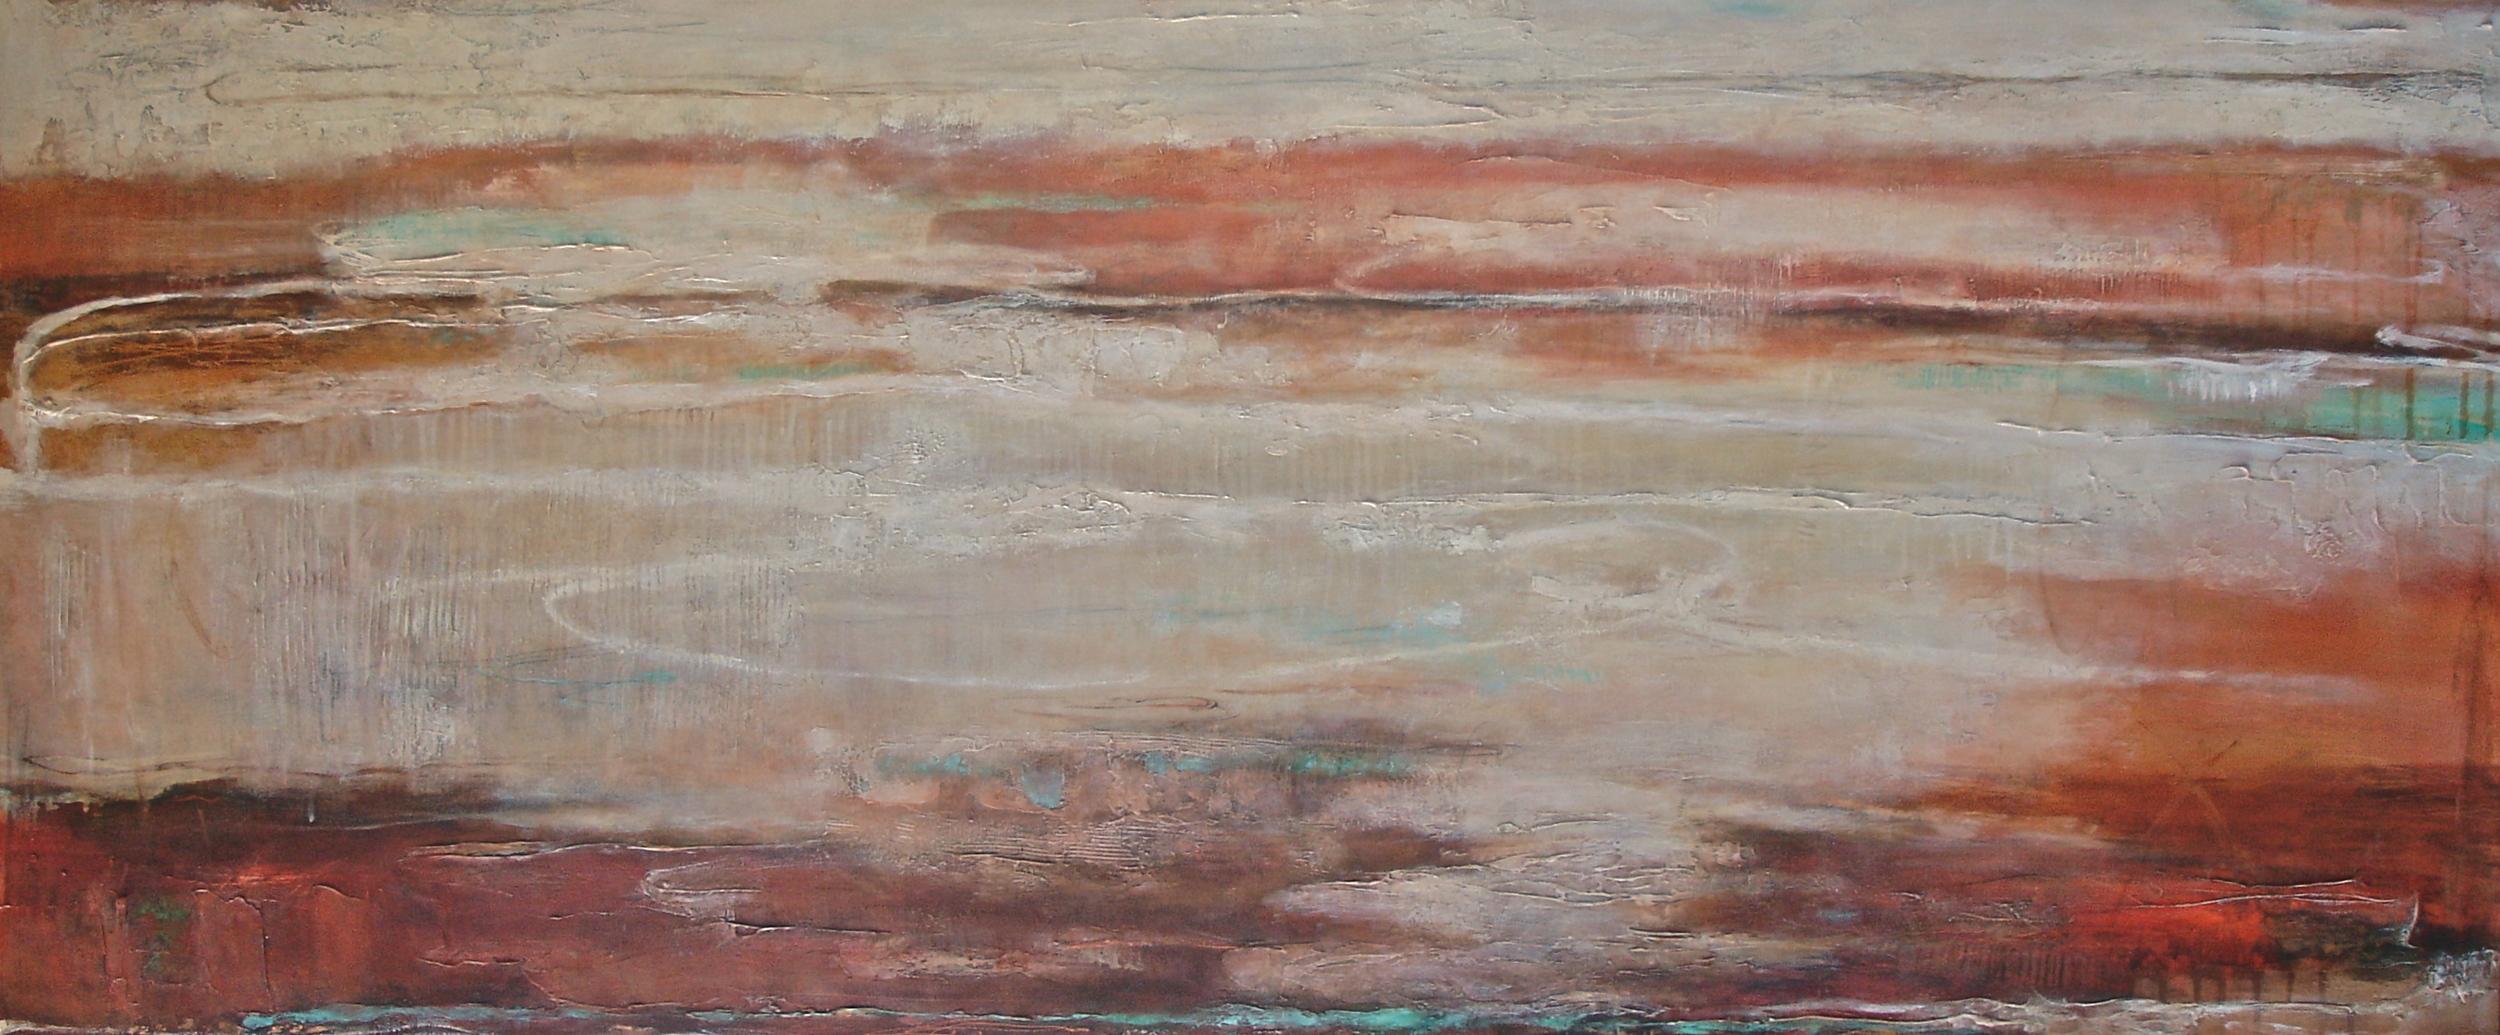 Reflections, 198 x 84 cm